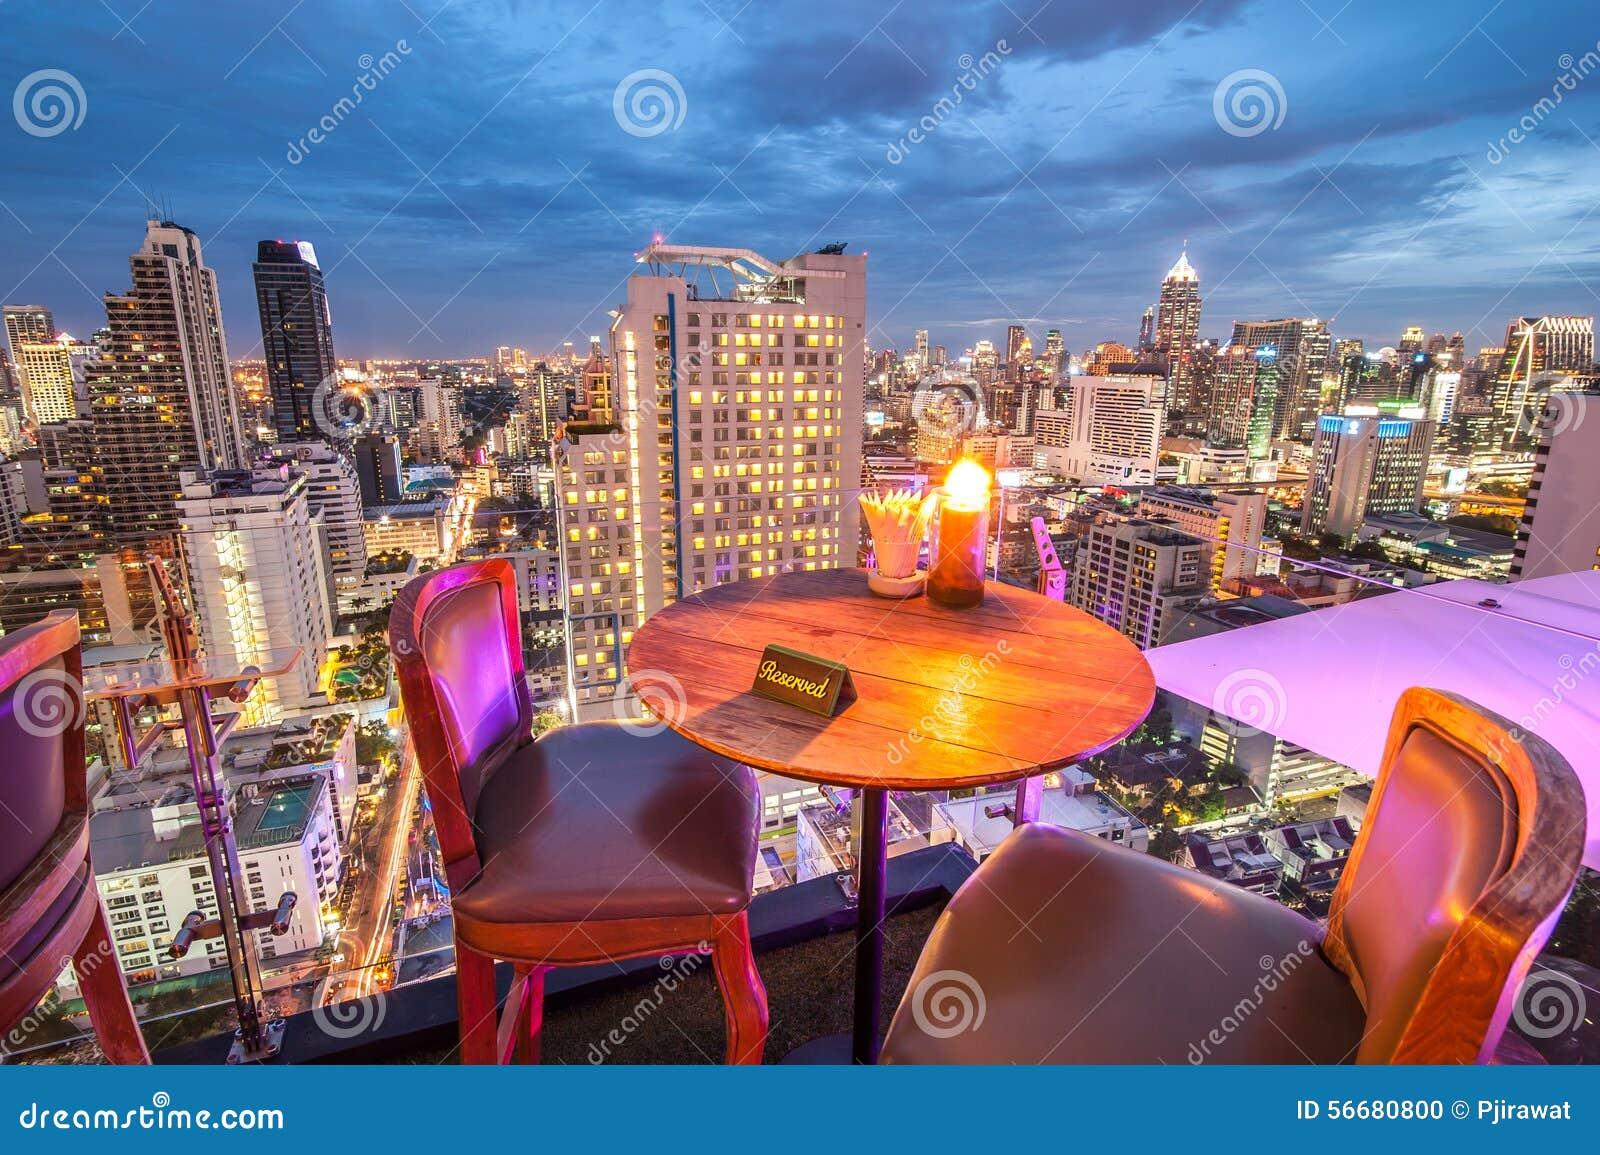 Rooftop Restaurant Stock Photo Image Of Luxury Terrace 56680800